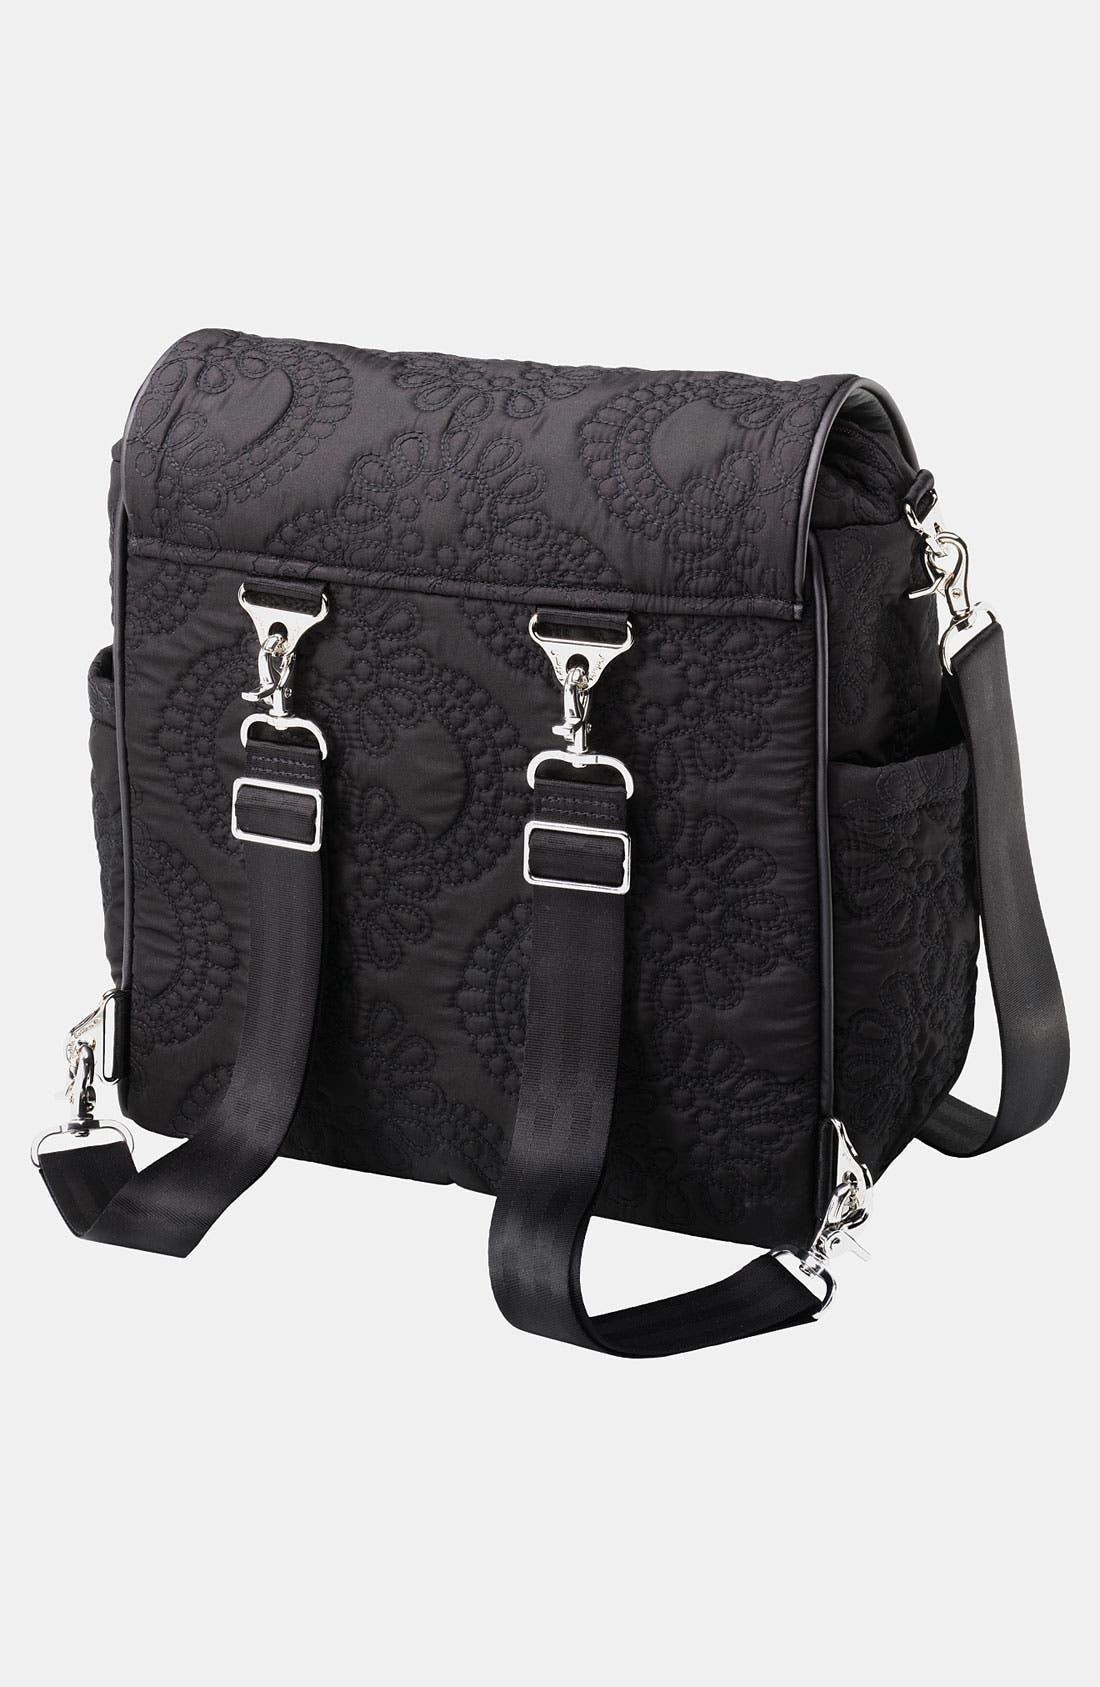 PETUNIA PICKLE BOTTOM,                             'Embossed Boxy' Magnetic Closure Backpack Diaper Bag,                             Alternate thumbnail 2, color,                             001